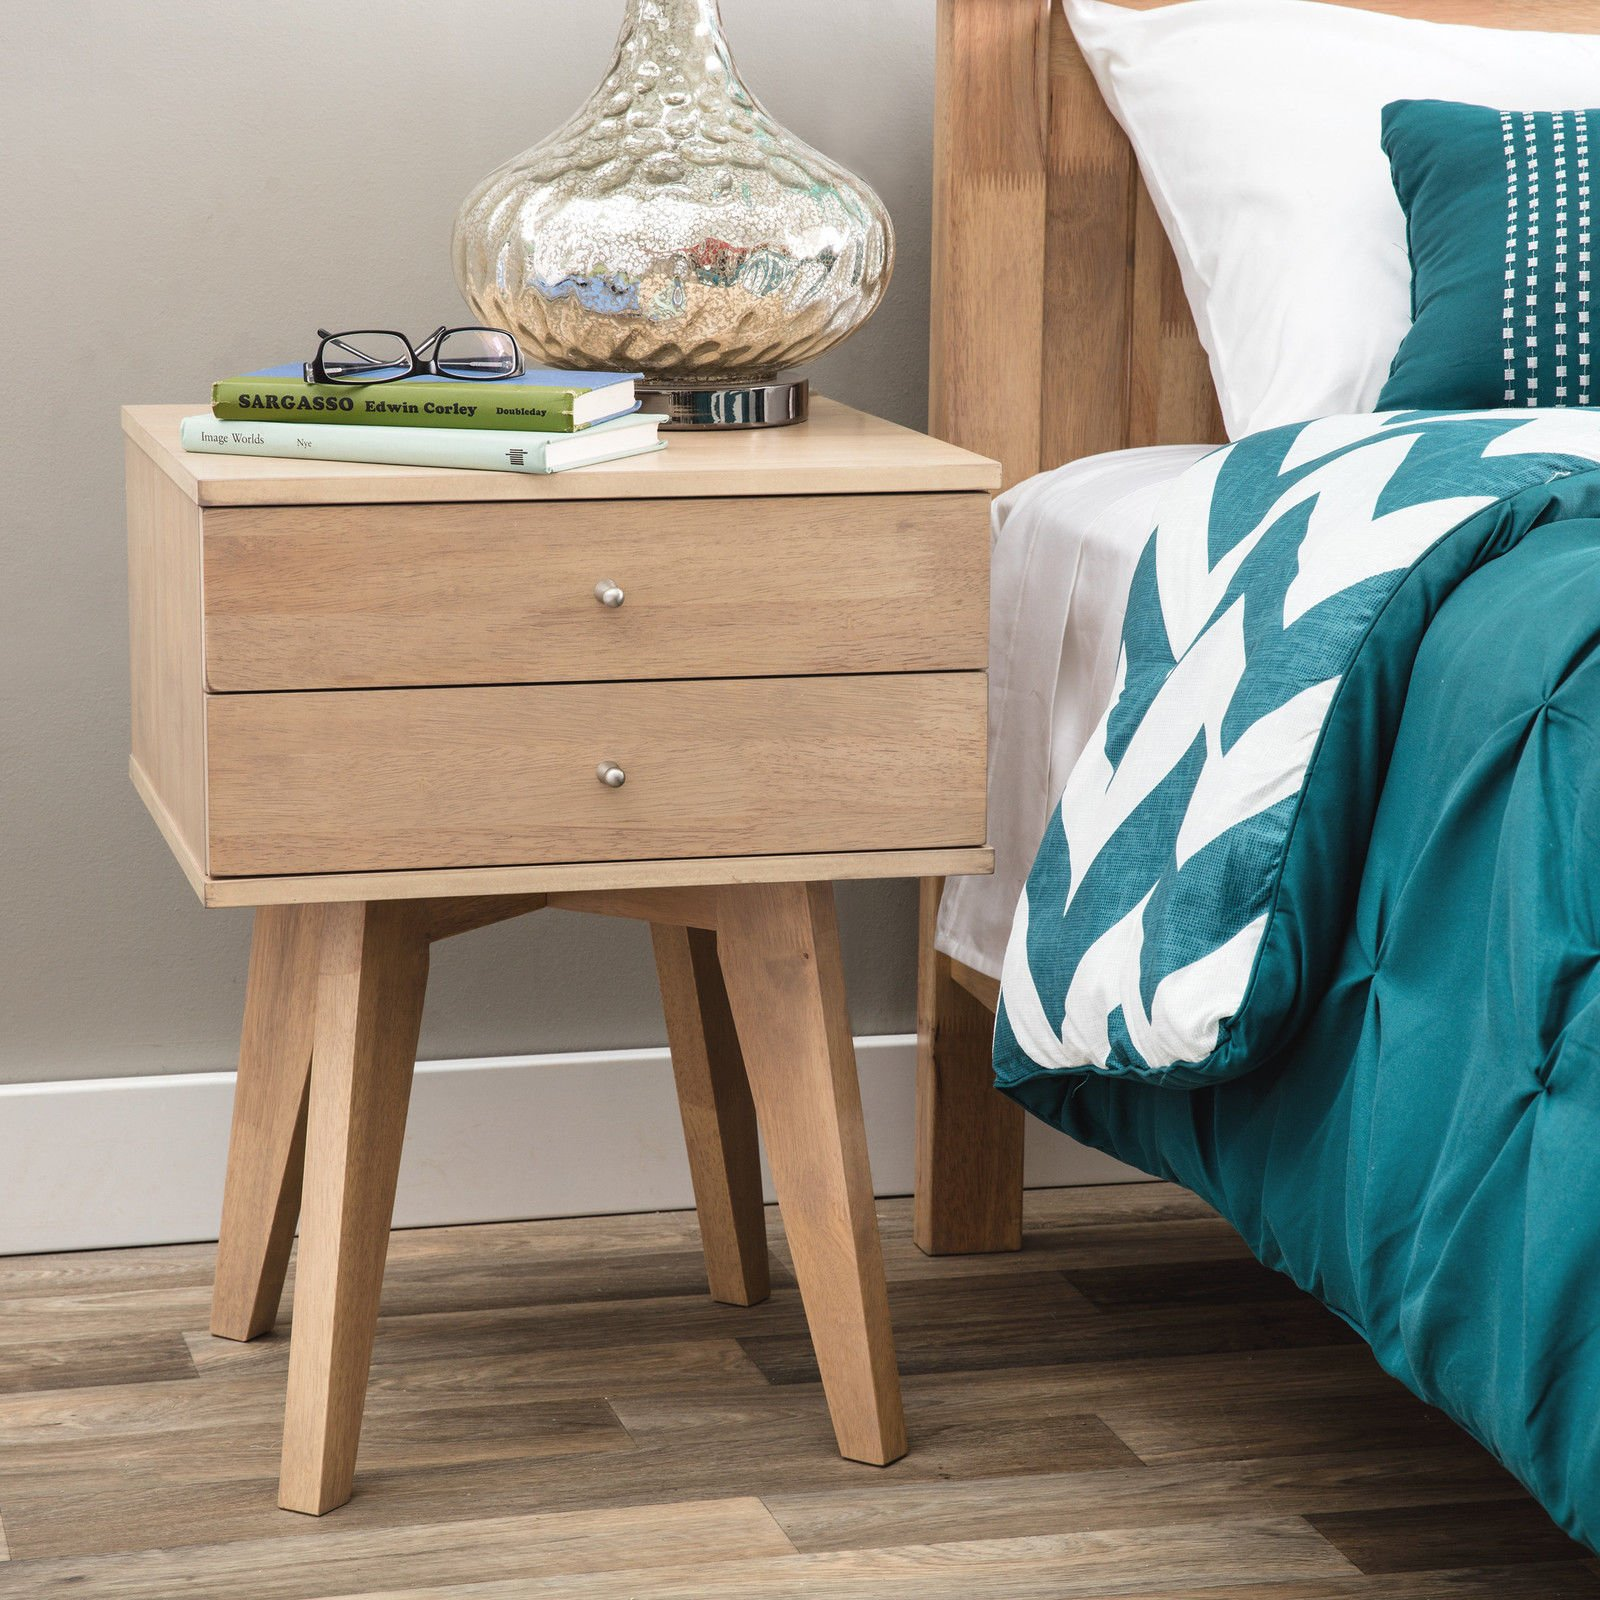 Sturdy I Love Living Jones Birch 2-Drawer Nightstand in Home Oak Finish